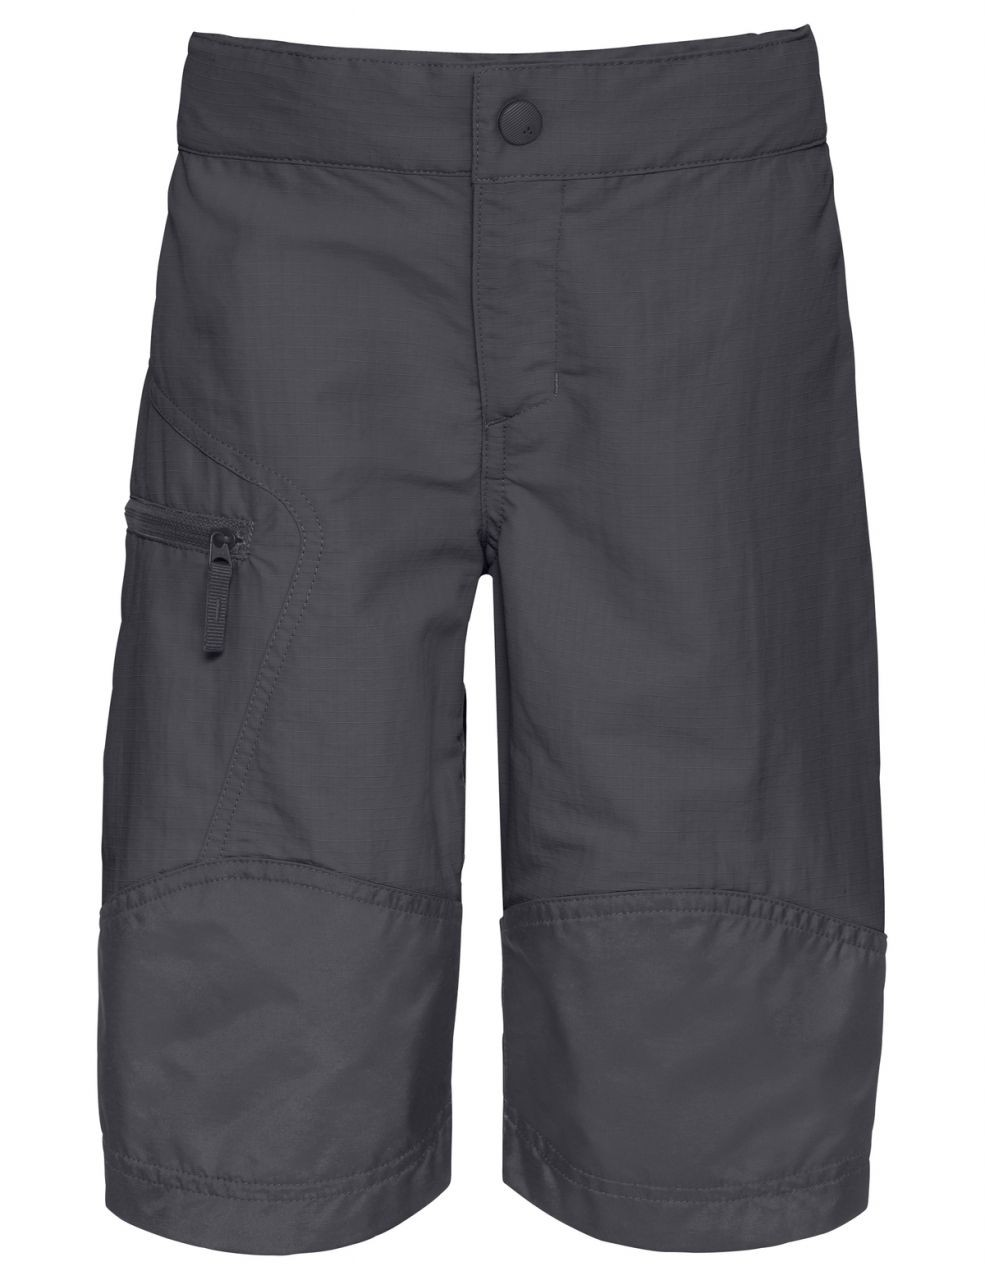 Vaude - Kids Caprea Shorts - Shorts - Kids